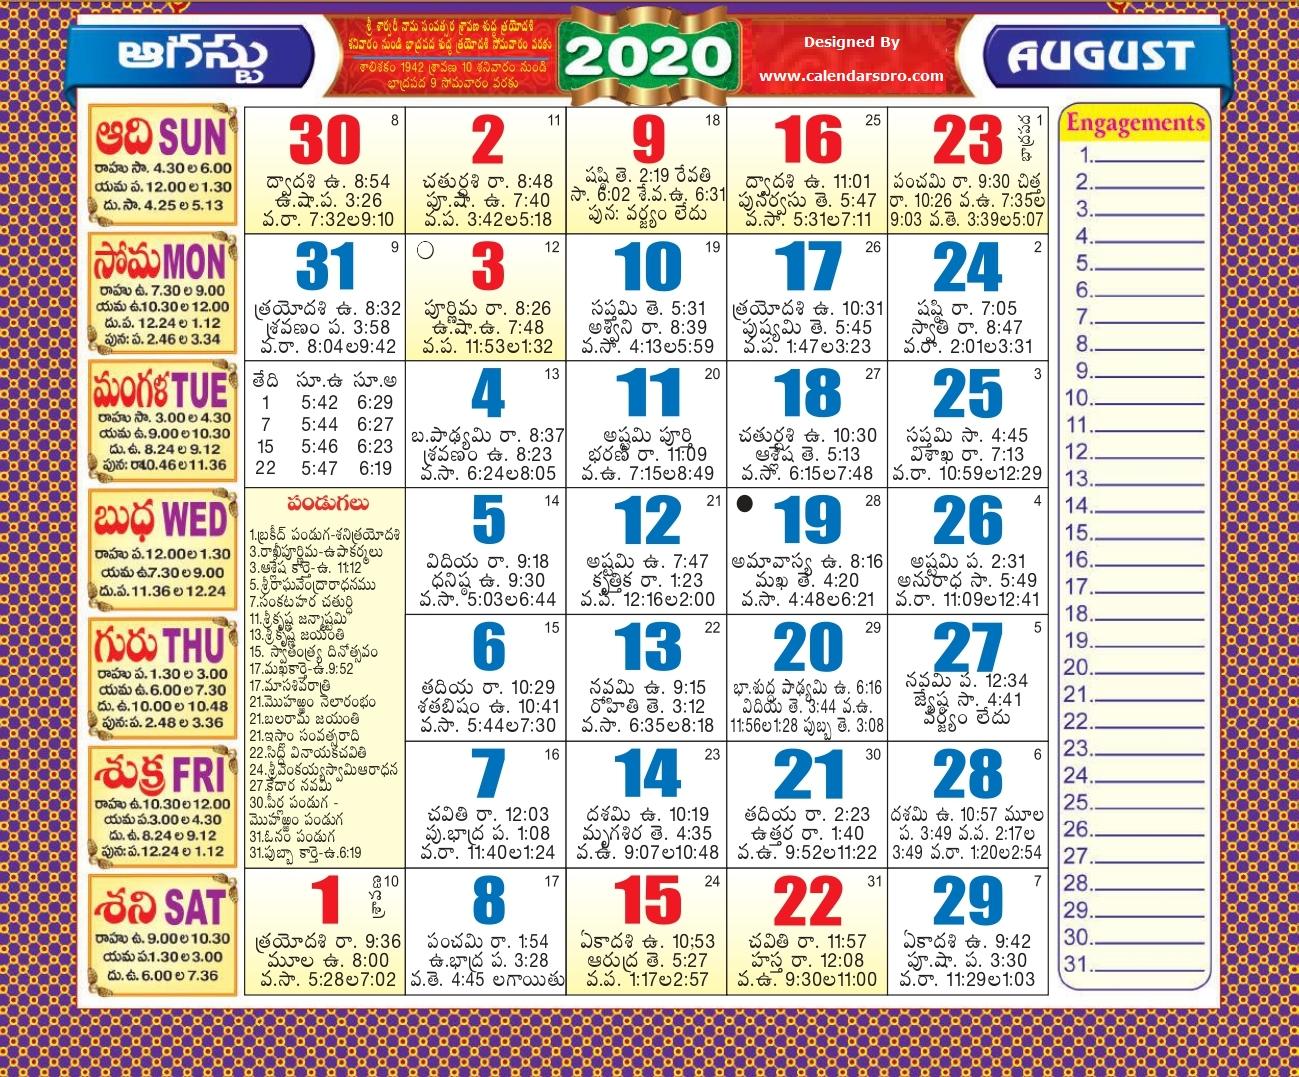 Telugu August 2020 Calendar | Calendar 2020, Calendar pertaining to Calender For 2020 Week Wise In Hindi